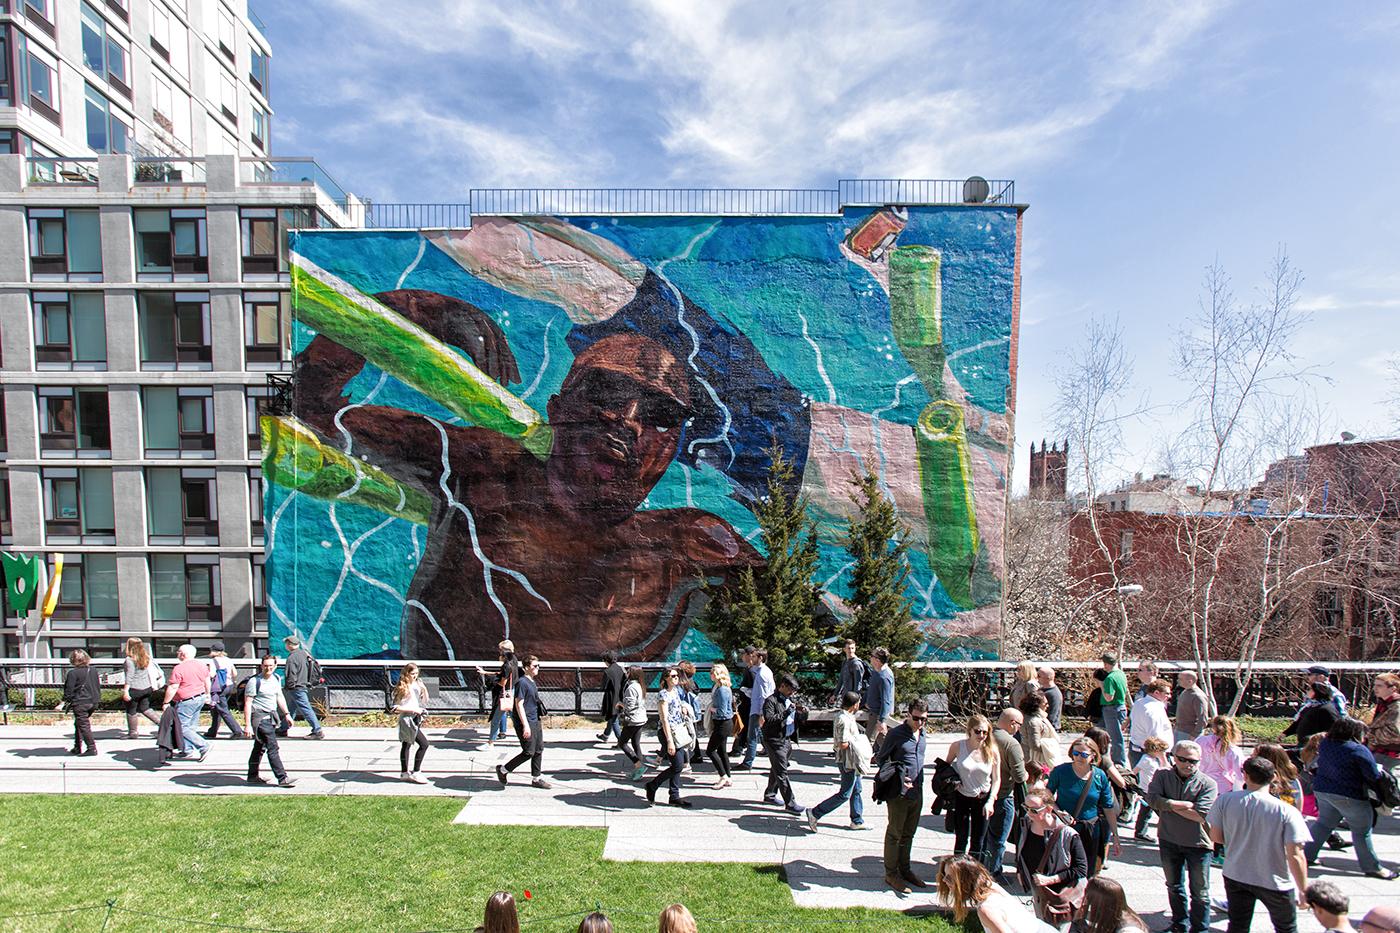 colossal-media-paint-ads-outdoor-advertising-billboard-nyc-new-york-highline-street-art